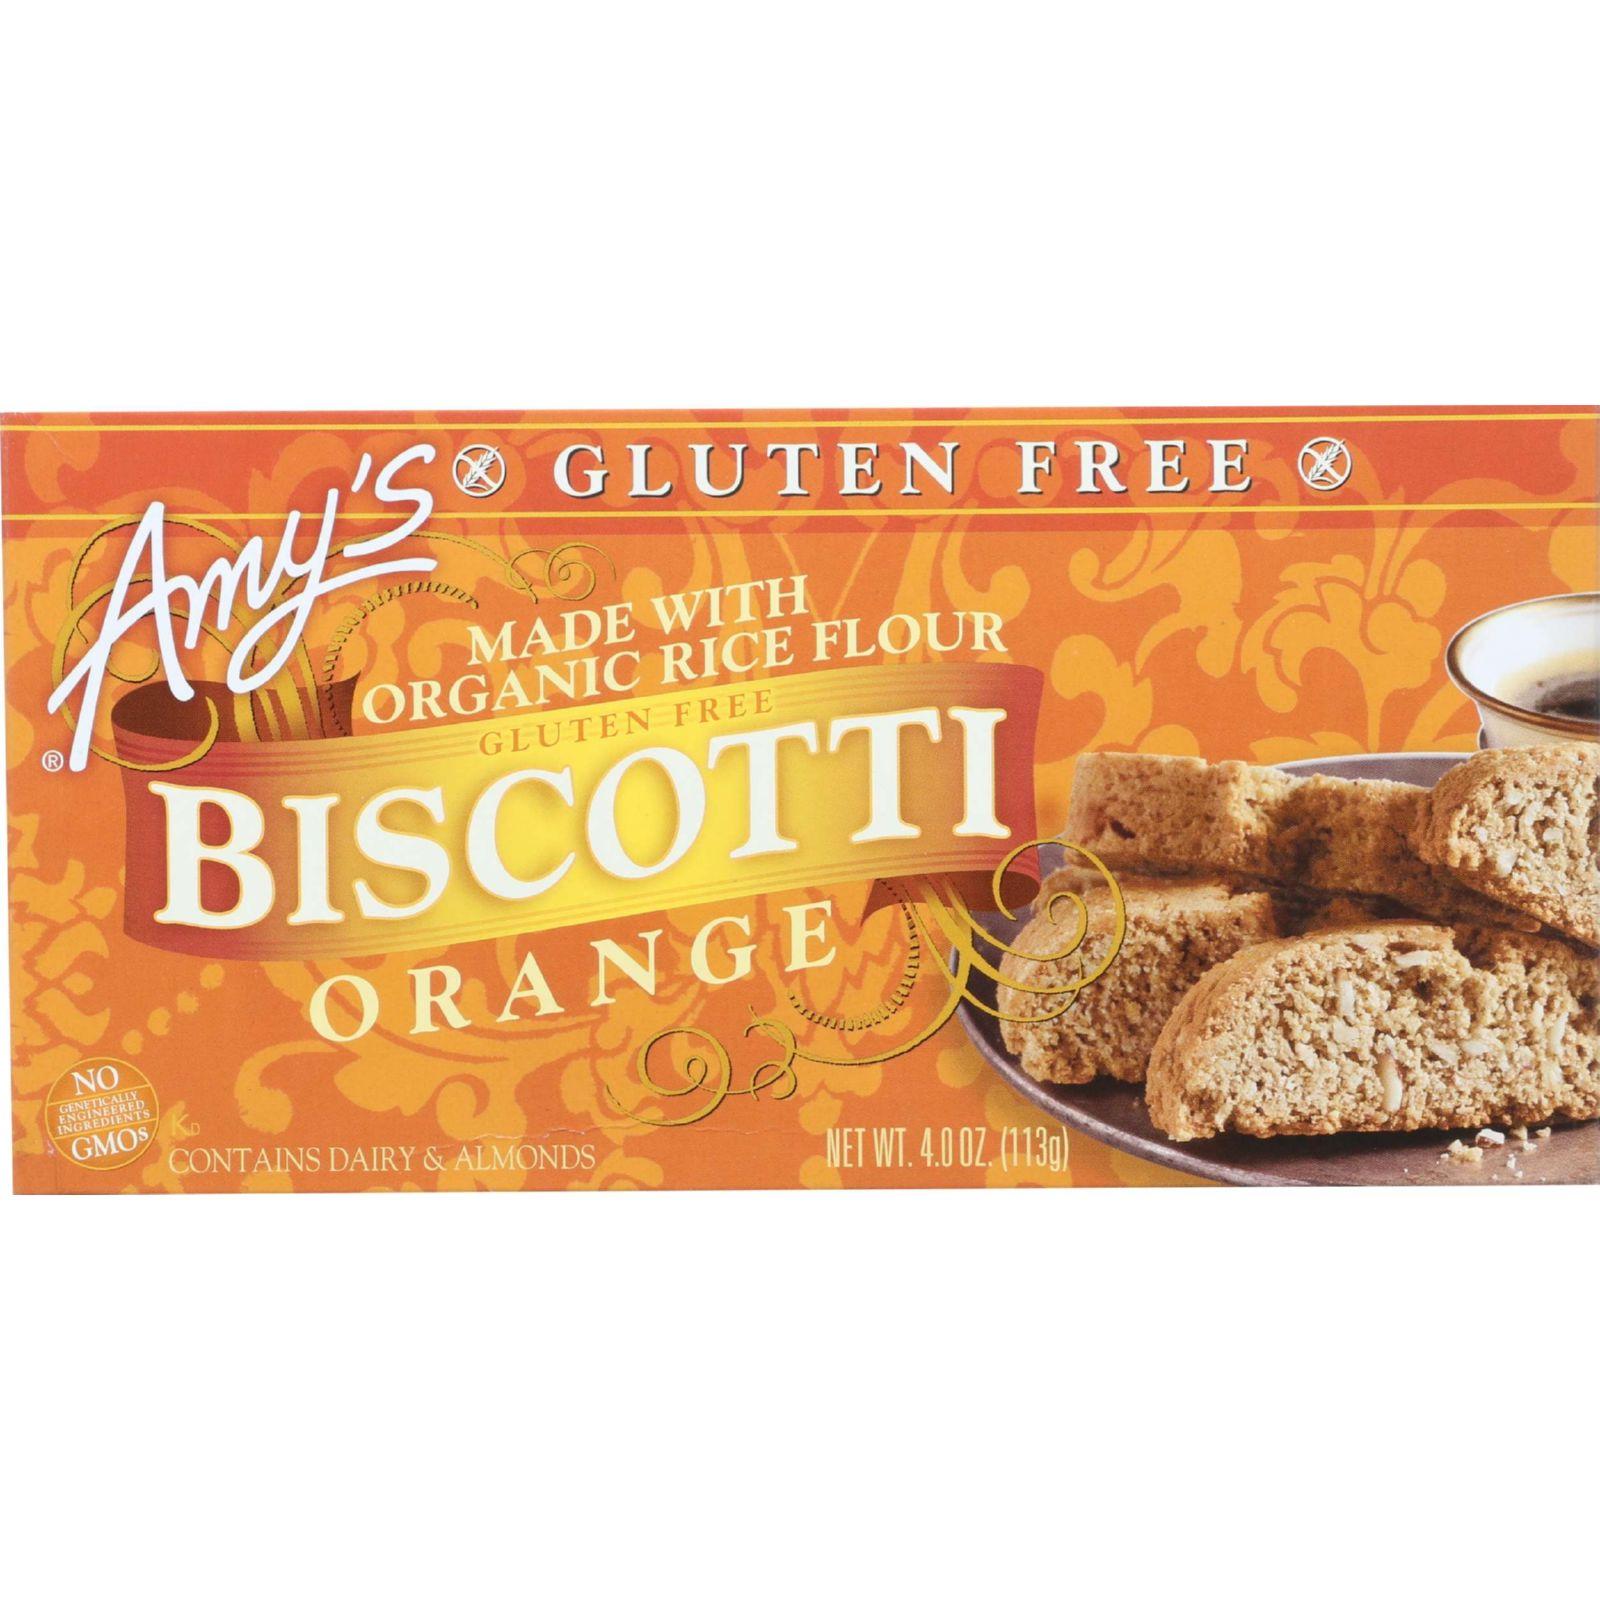 Amys Biscotti - Organic - Orange - Gluten Free - 4 oz - case of 6